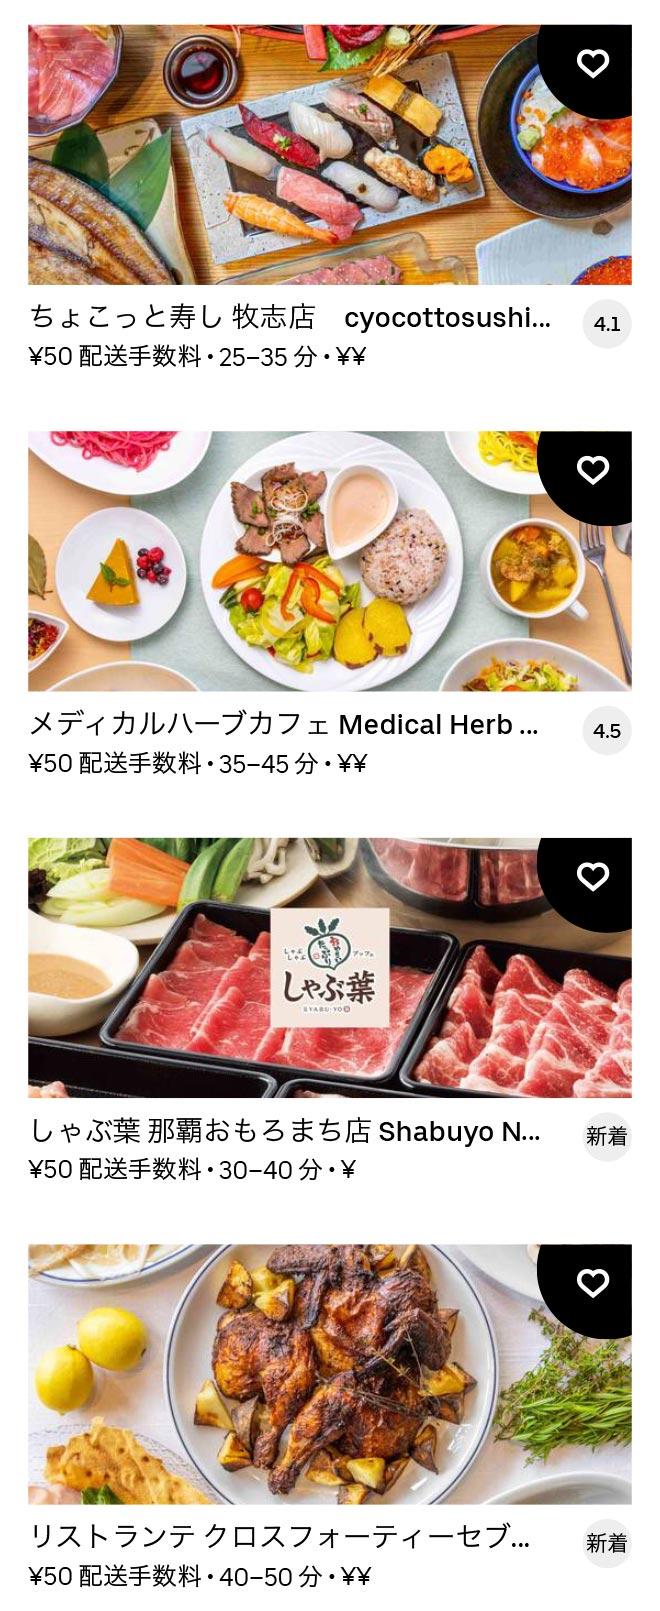 Omoromachi menu 2011 12